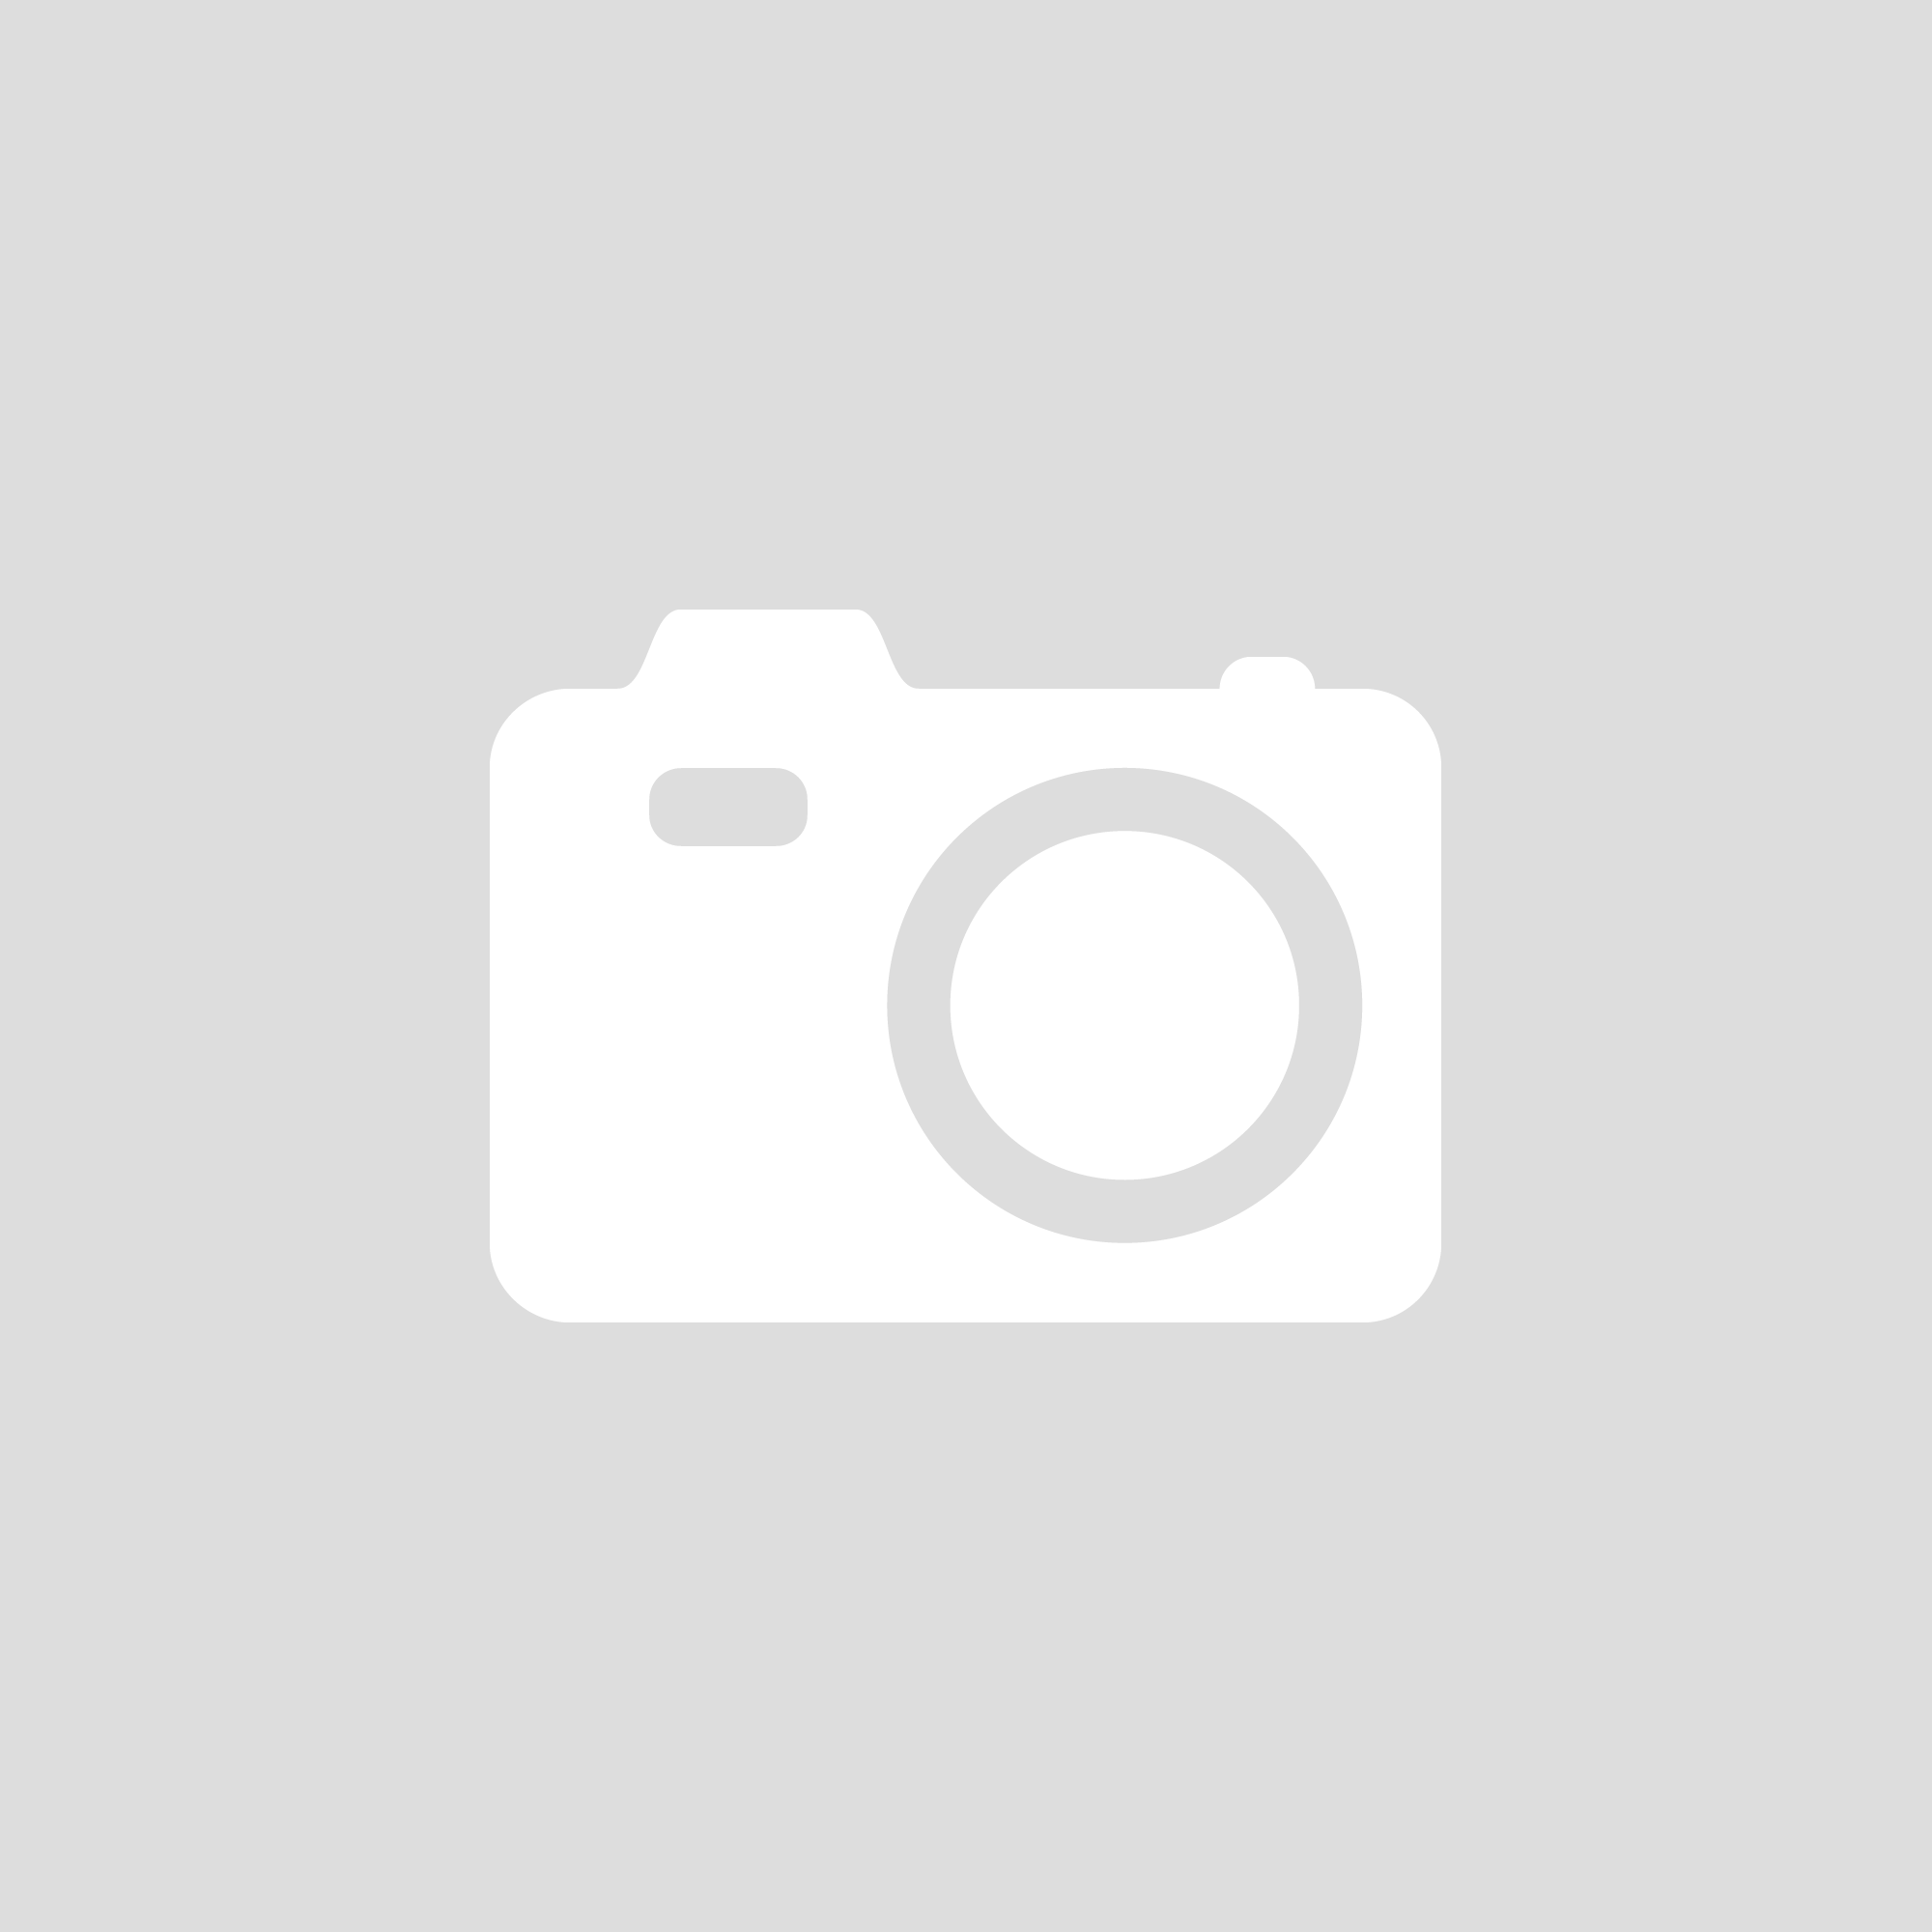 Shaggy Plait Textured Cushion in Terracotta by CIMC